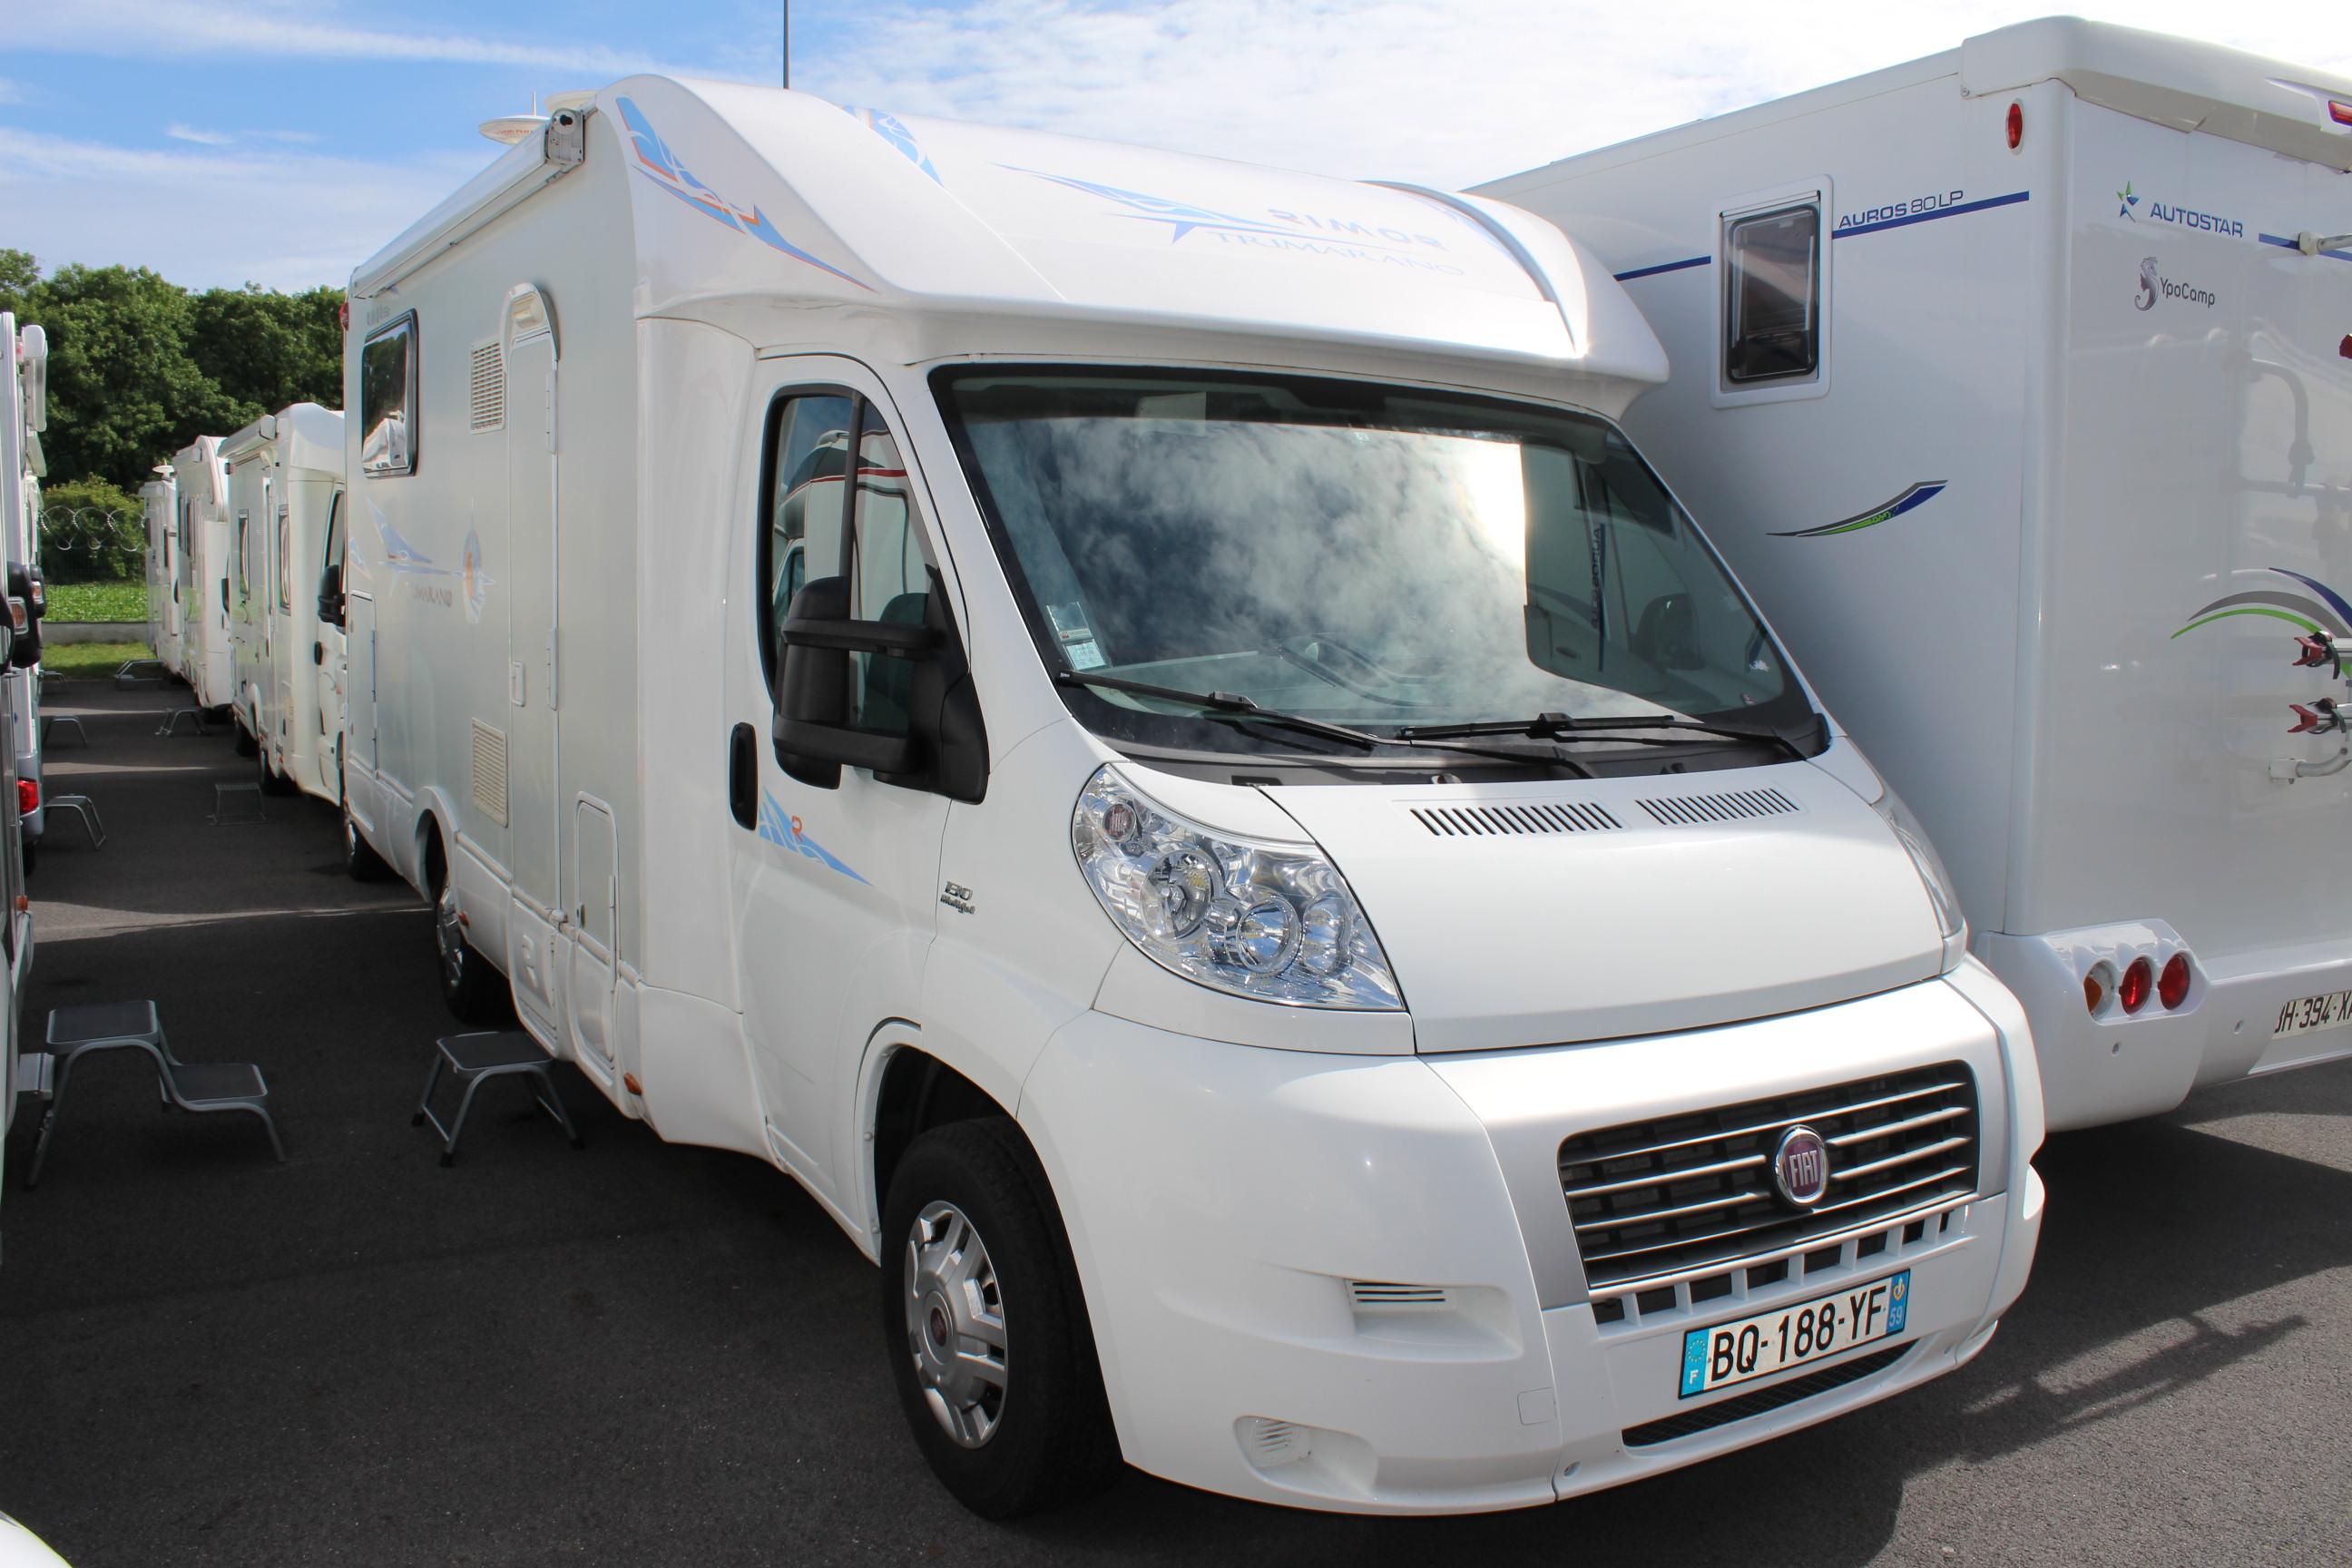 rimor trimarano 69 p occasion de 2011 fiat camping car en vente seclin nord 59. Black Bedroom Furniture Sets. Home Design Ideas